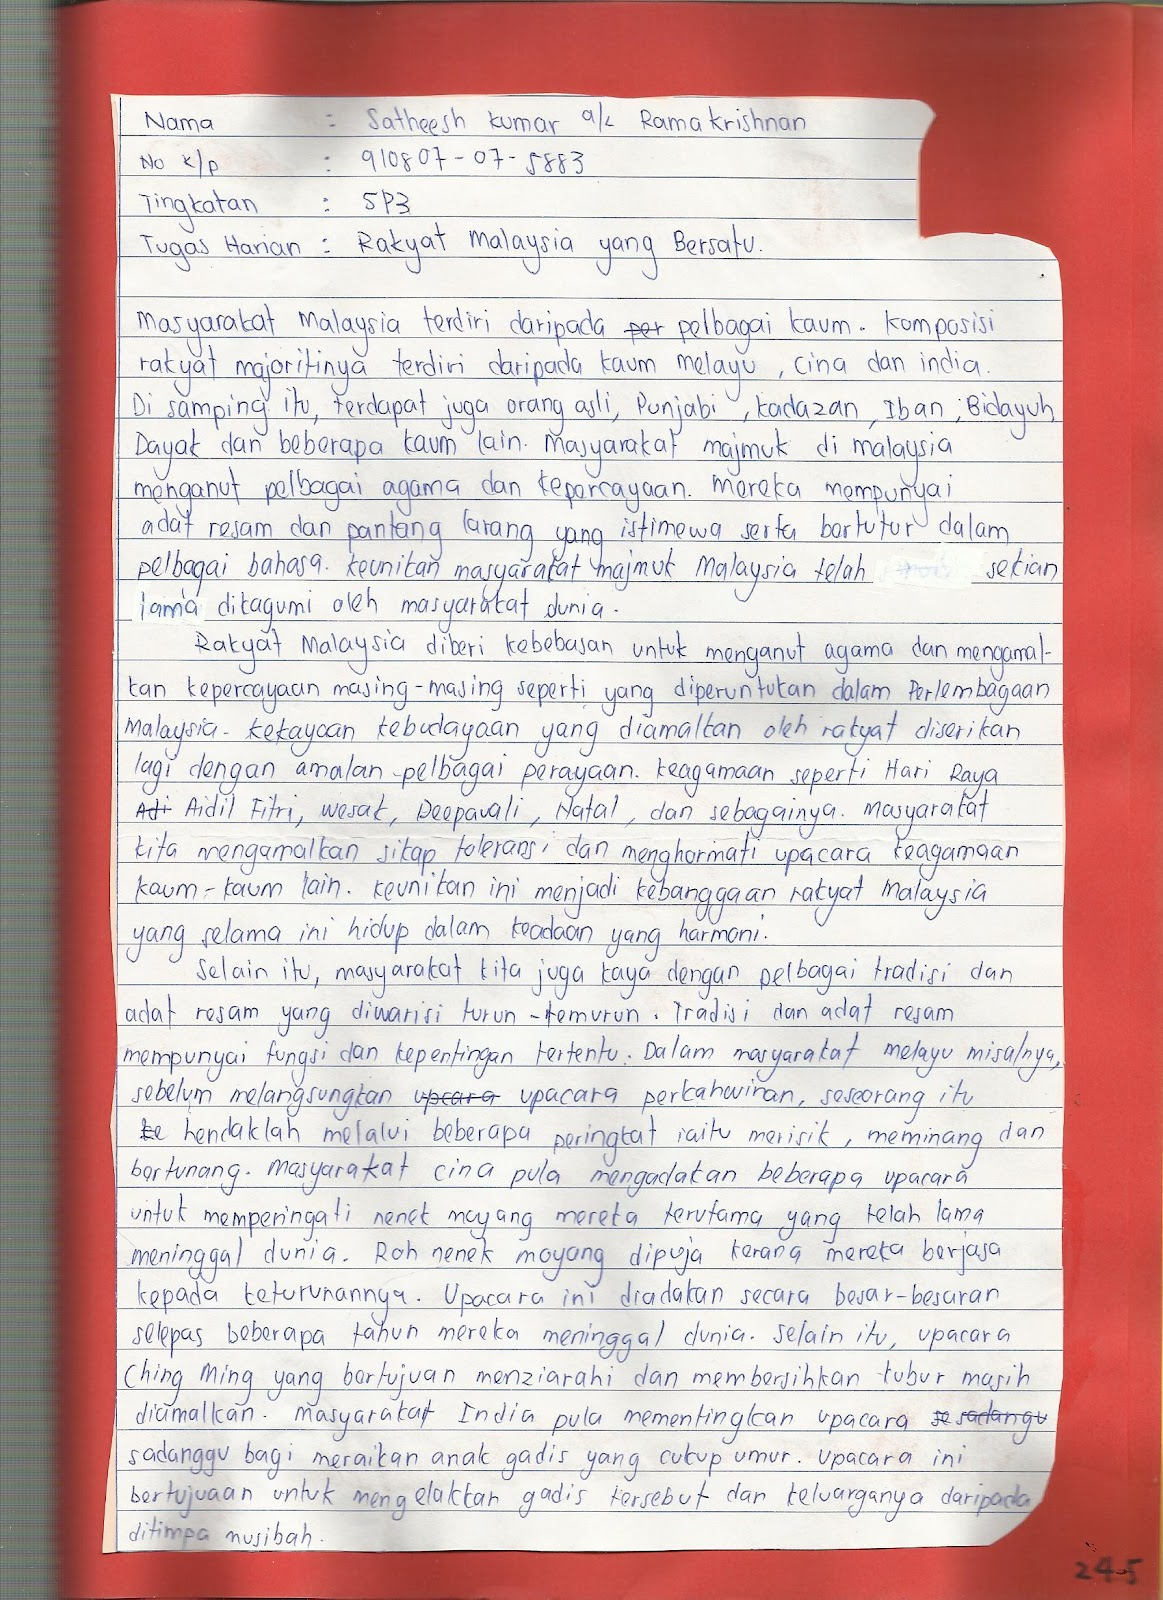 moral essay moral essay folio moral folio essay tingkatan moral  moral folio essay tingkatan moral folio essay tingkatan 4 moral dilemma essay